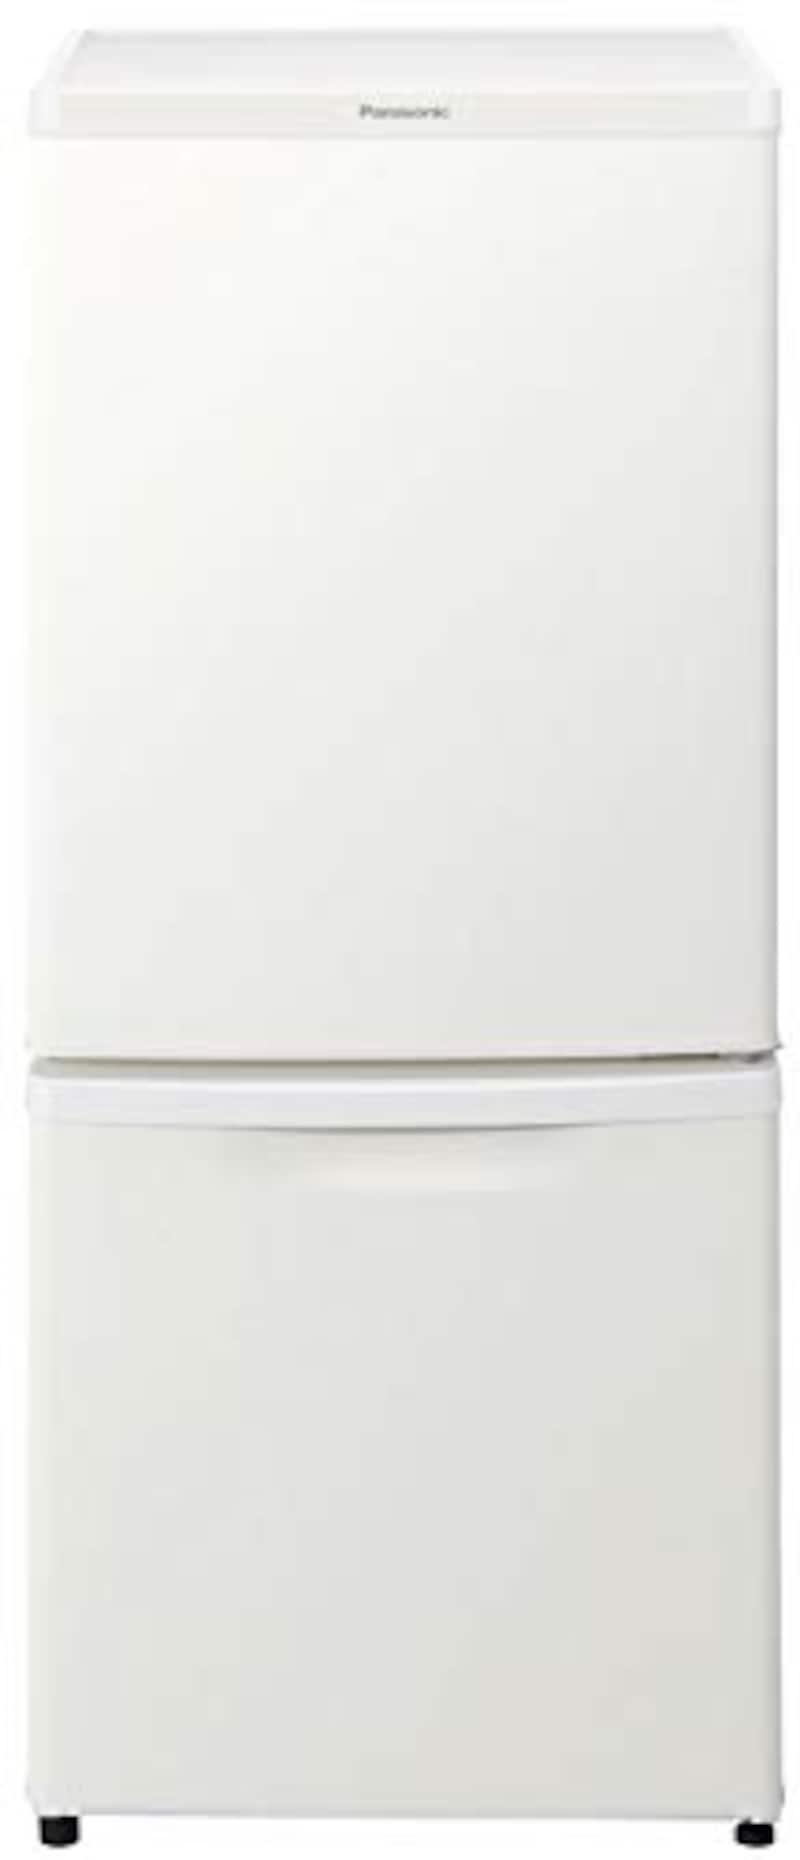 Panasonic(パナソニック),2ドア冷蔵庫 マットバニラホワイト,NR-B14DW-W